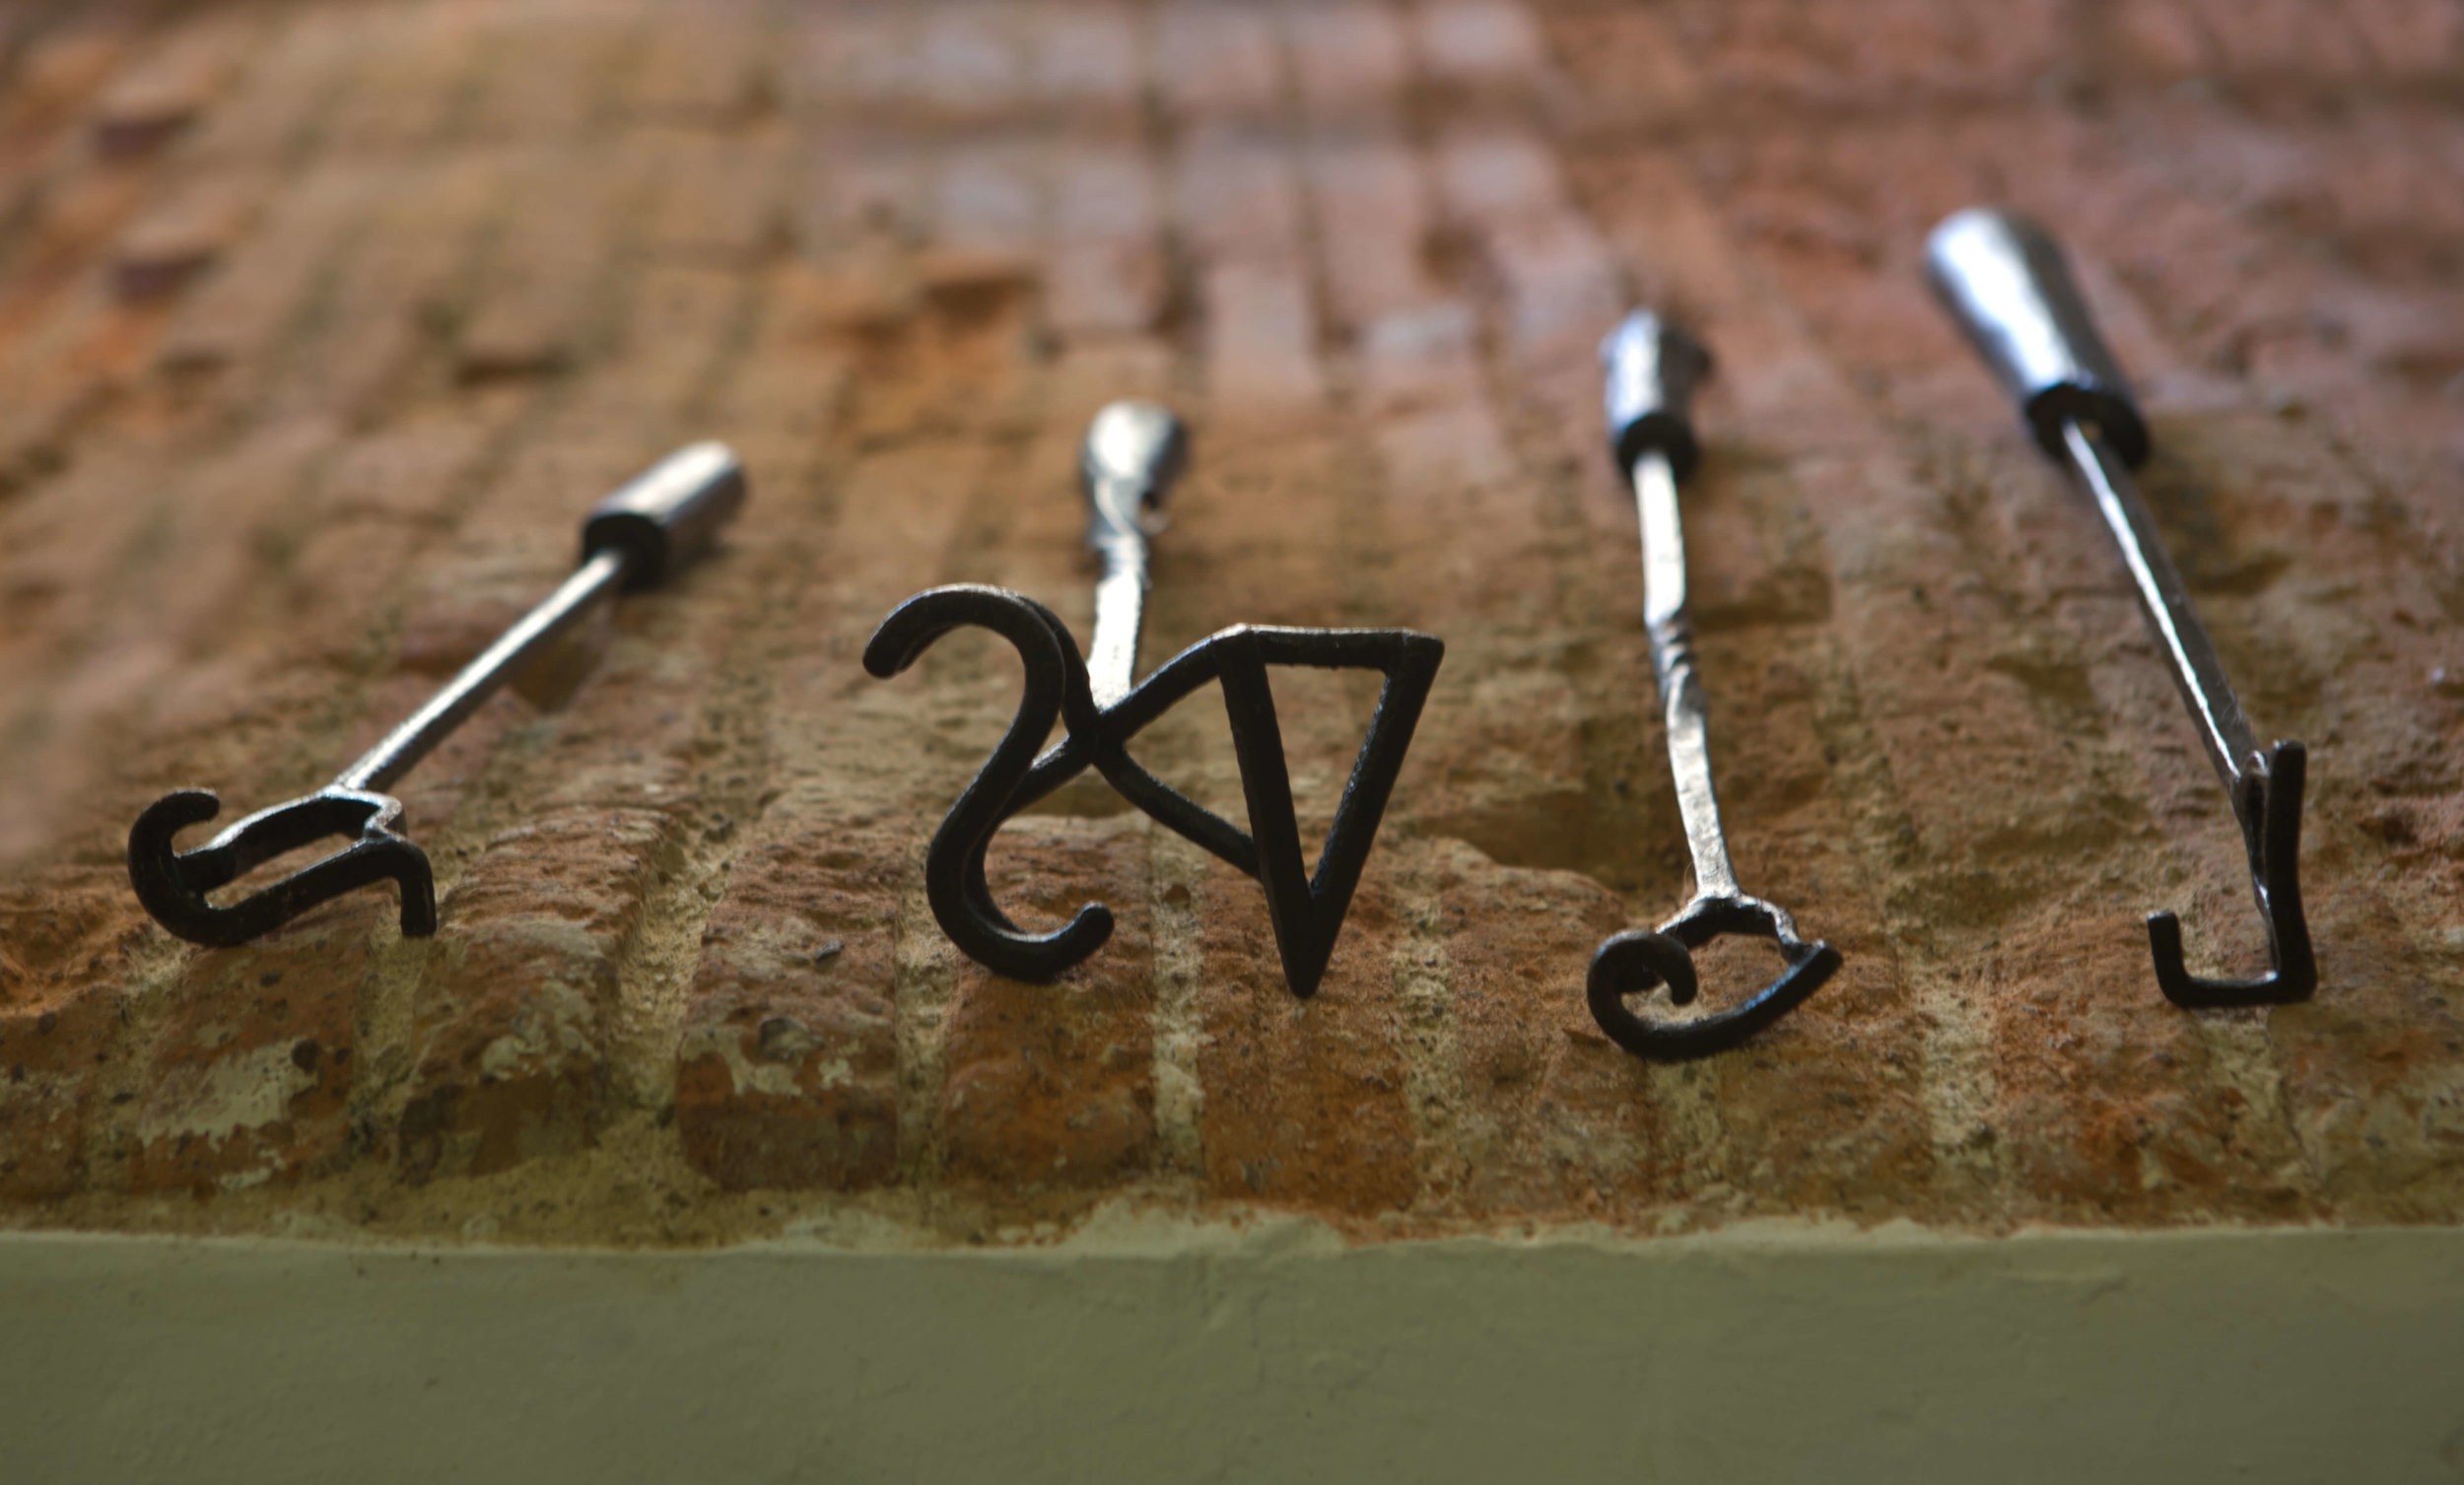 Branding irons displayed on brick